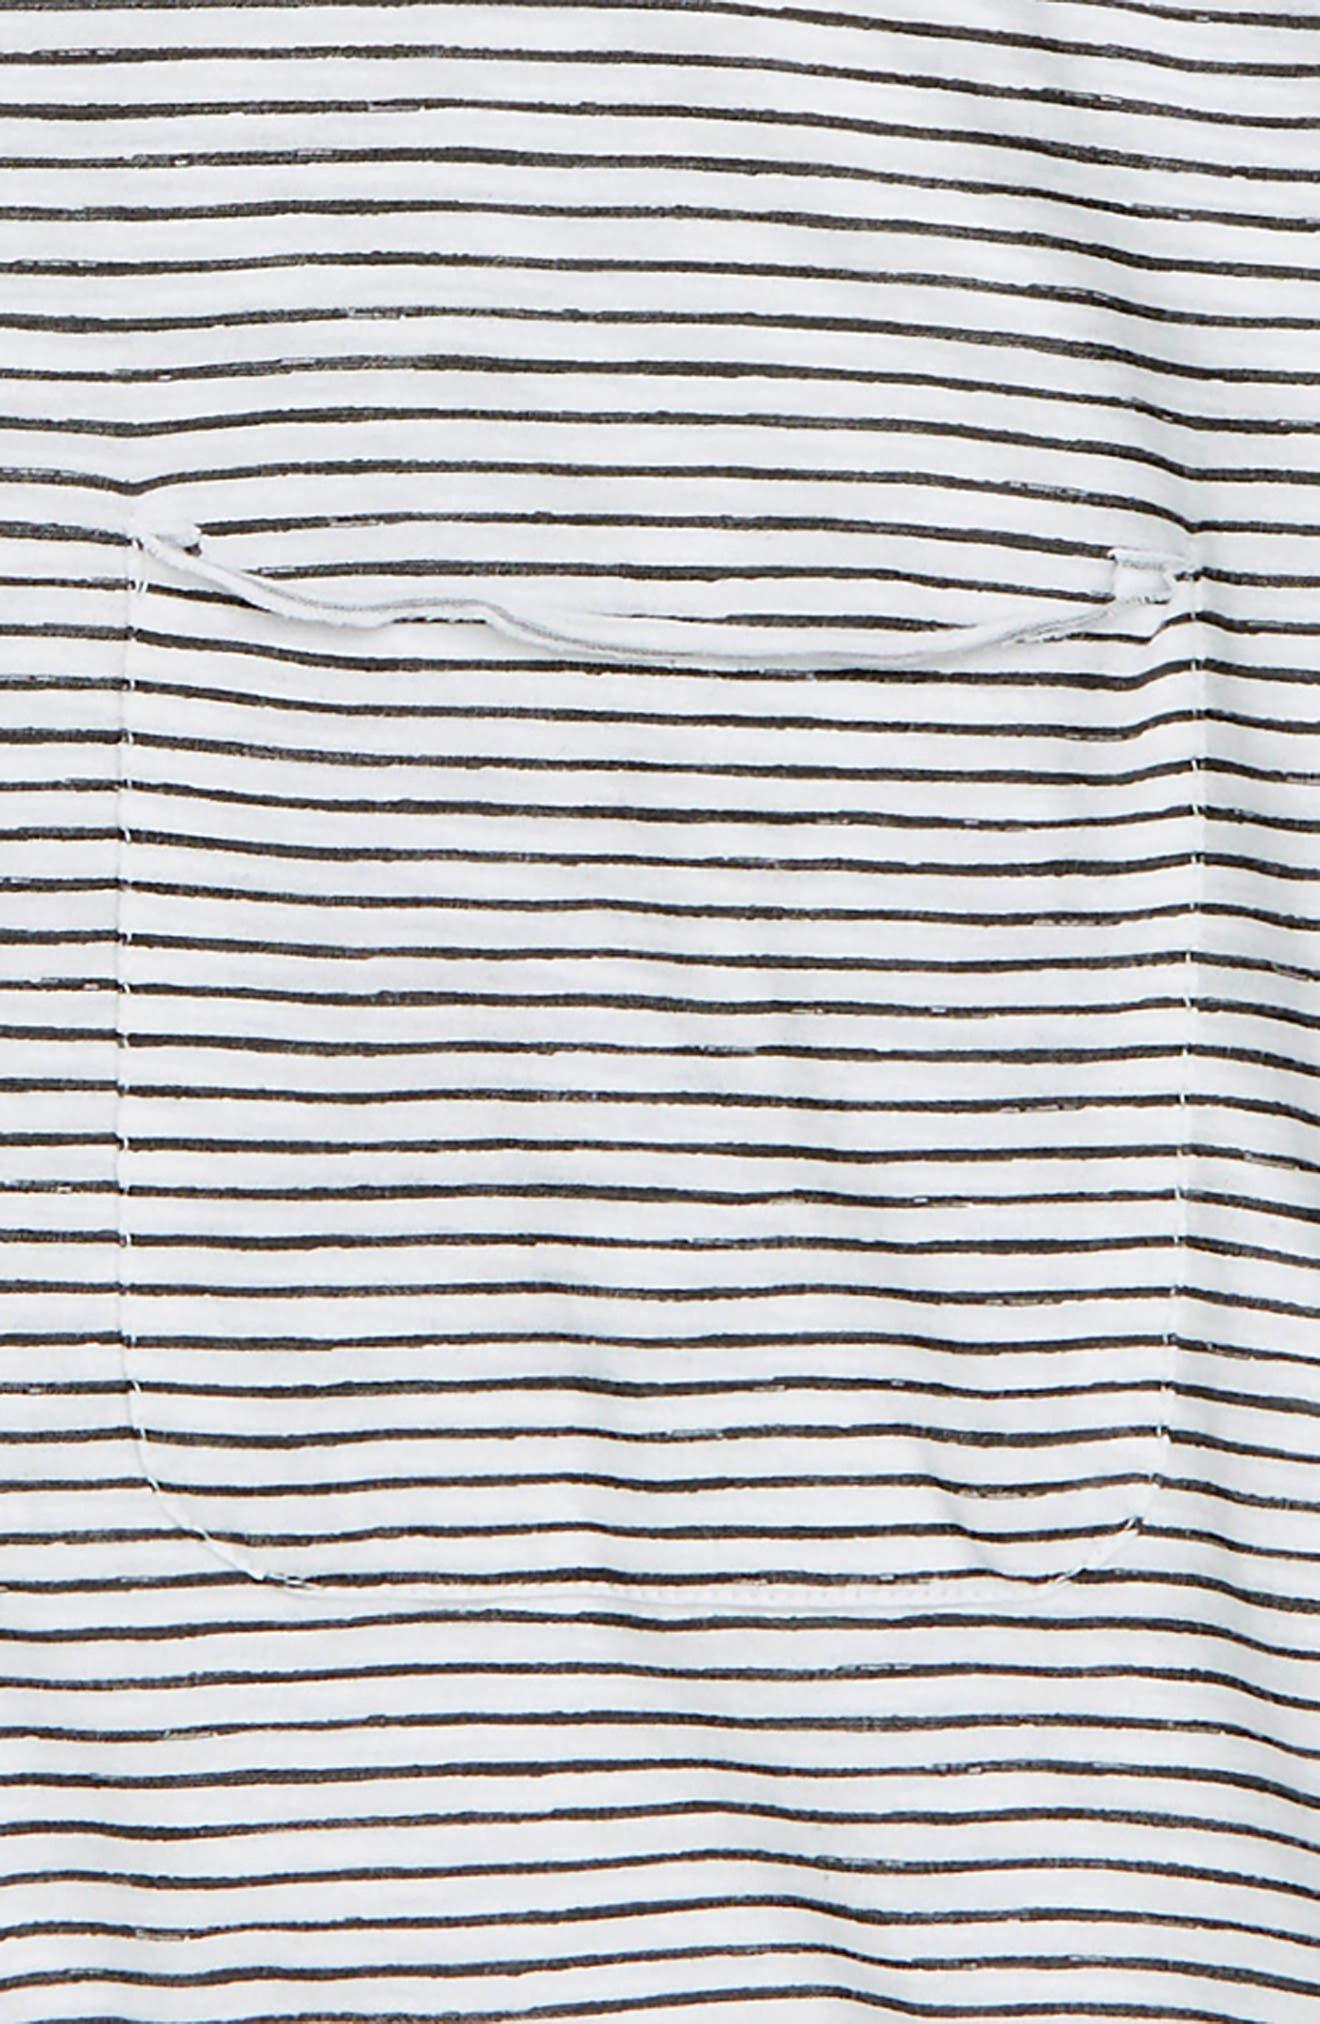 Painted Stripe T-Shirt,                             Alternate thumbnail 2, color,                             WHITE- GREY PAINTED STRIPE